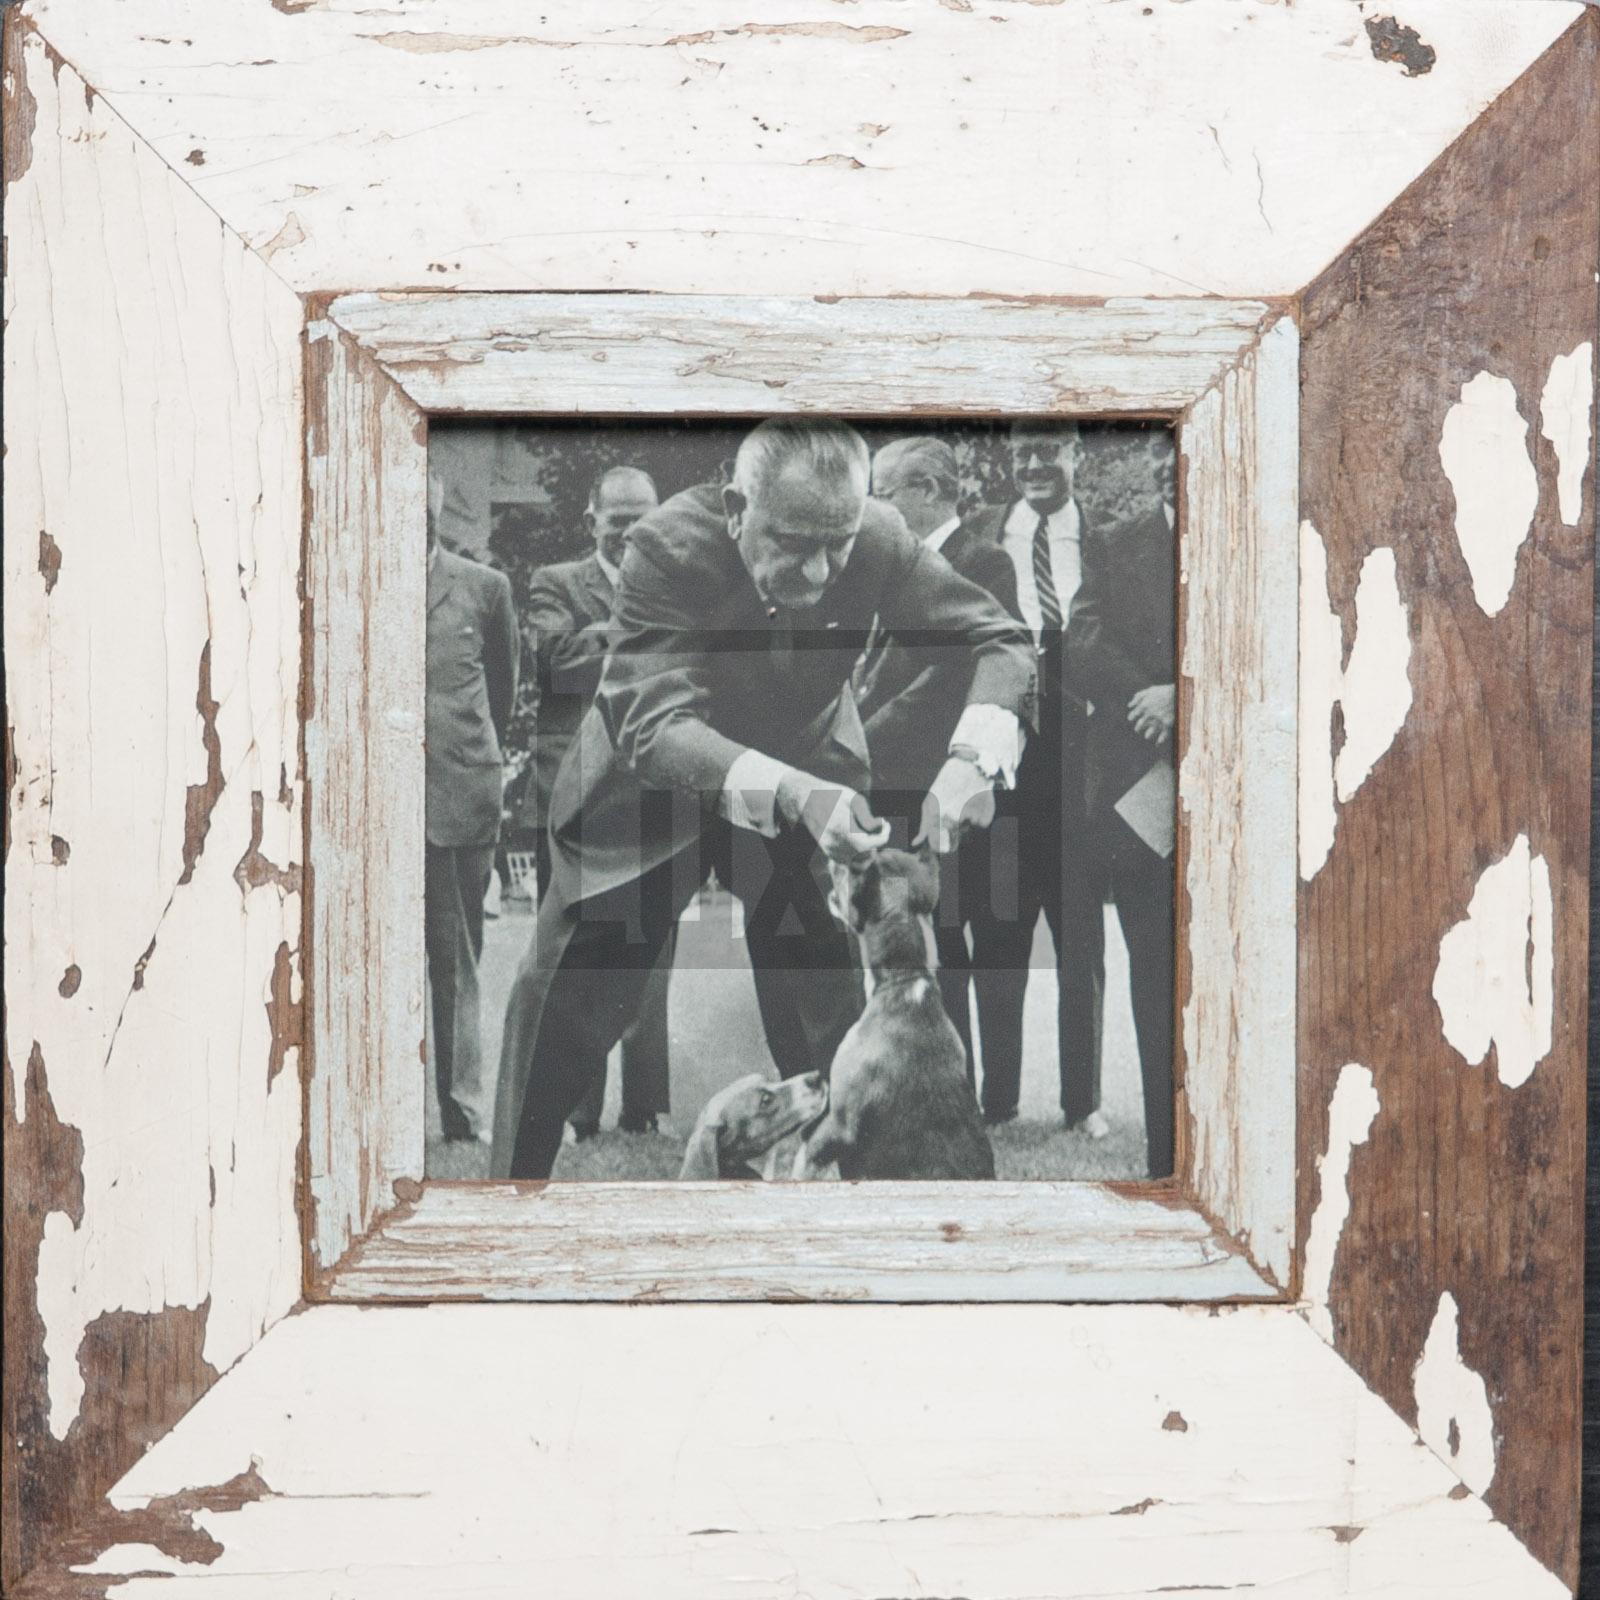 Quadratischer Bilderrahmen für ca. 14,8 x 14,8 cm große Fotos